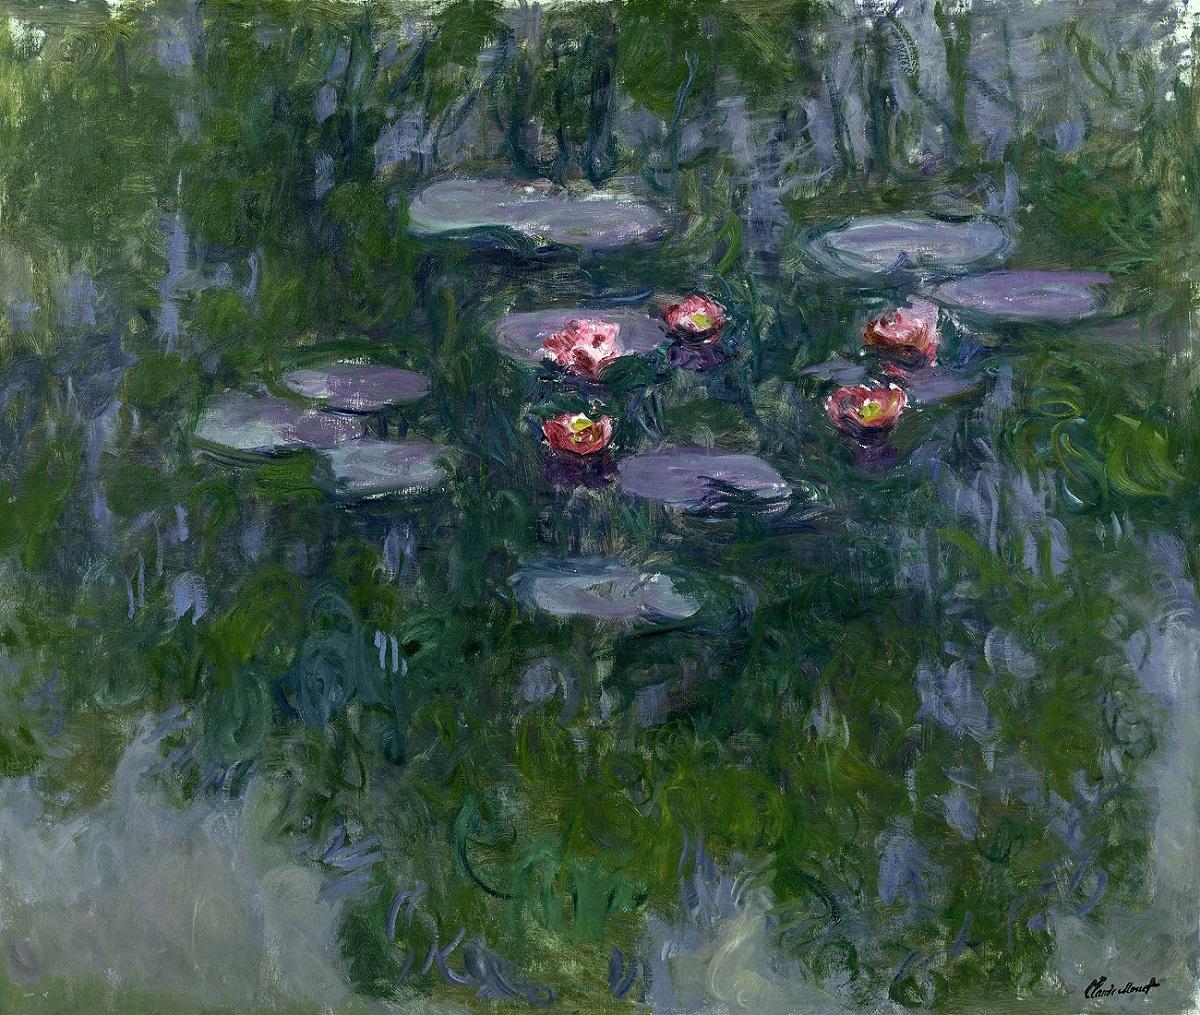 Claude Monet, Nymphéas, 1916-1919